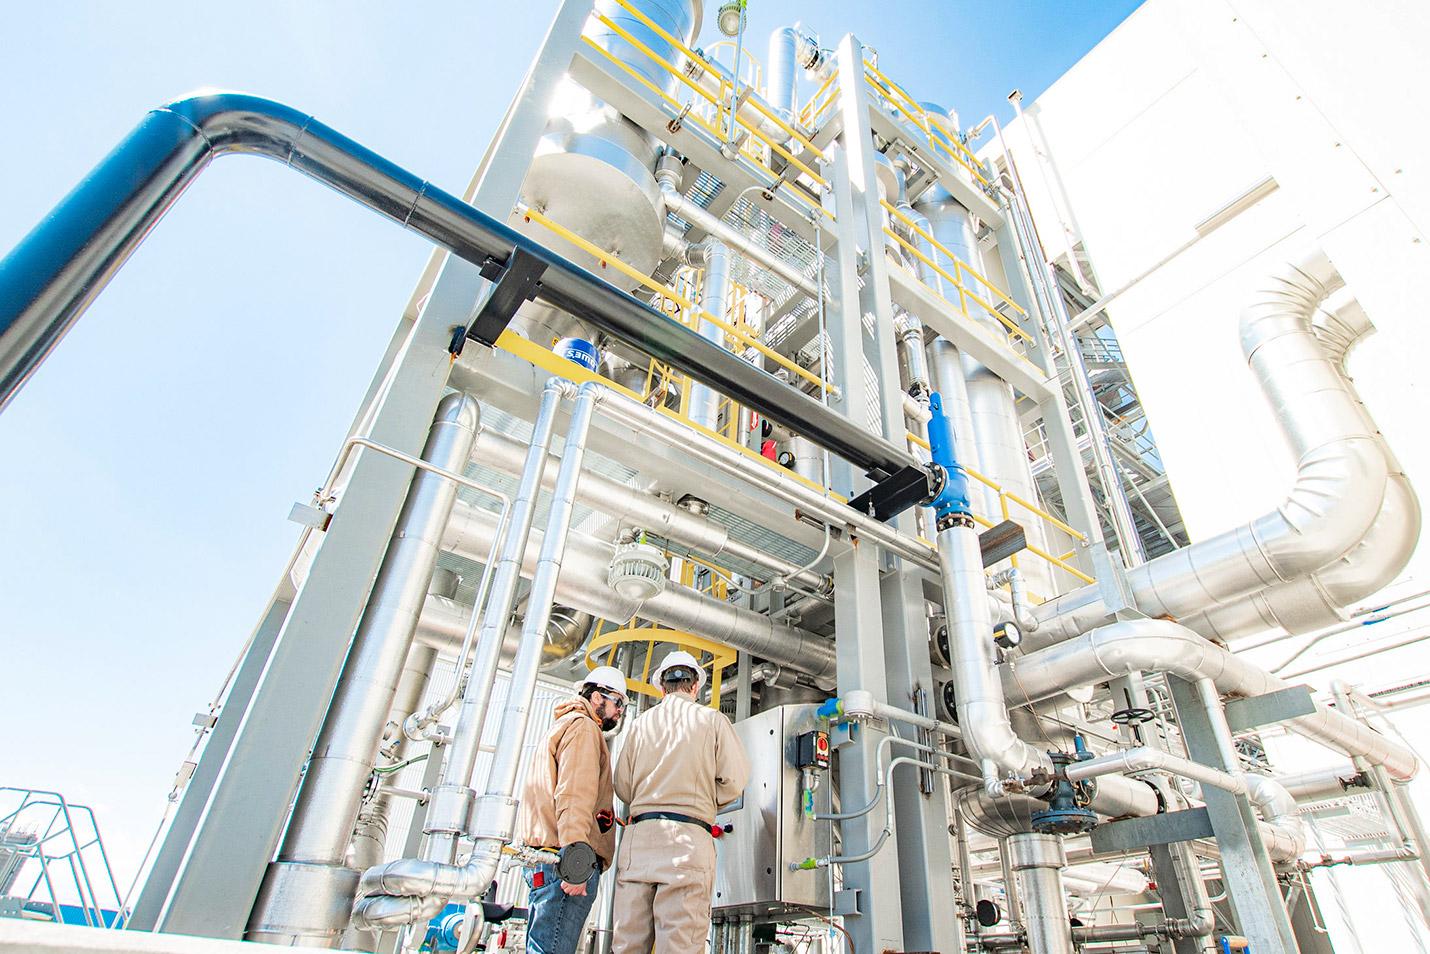 New Commercial Manufacturing Plant - Danimer Scientific